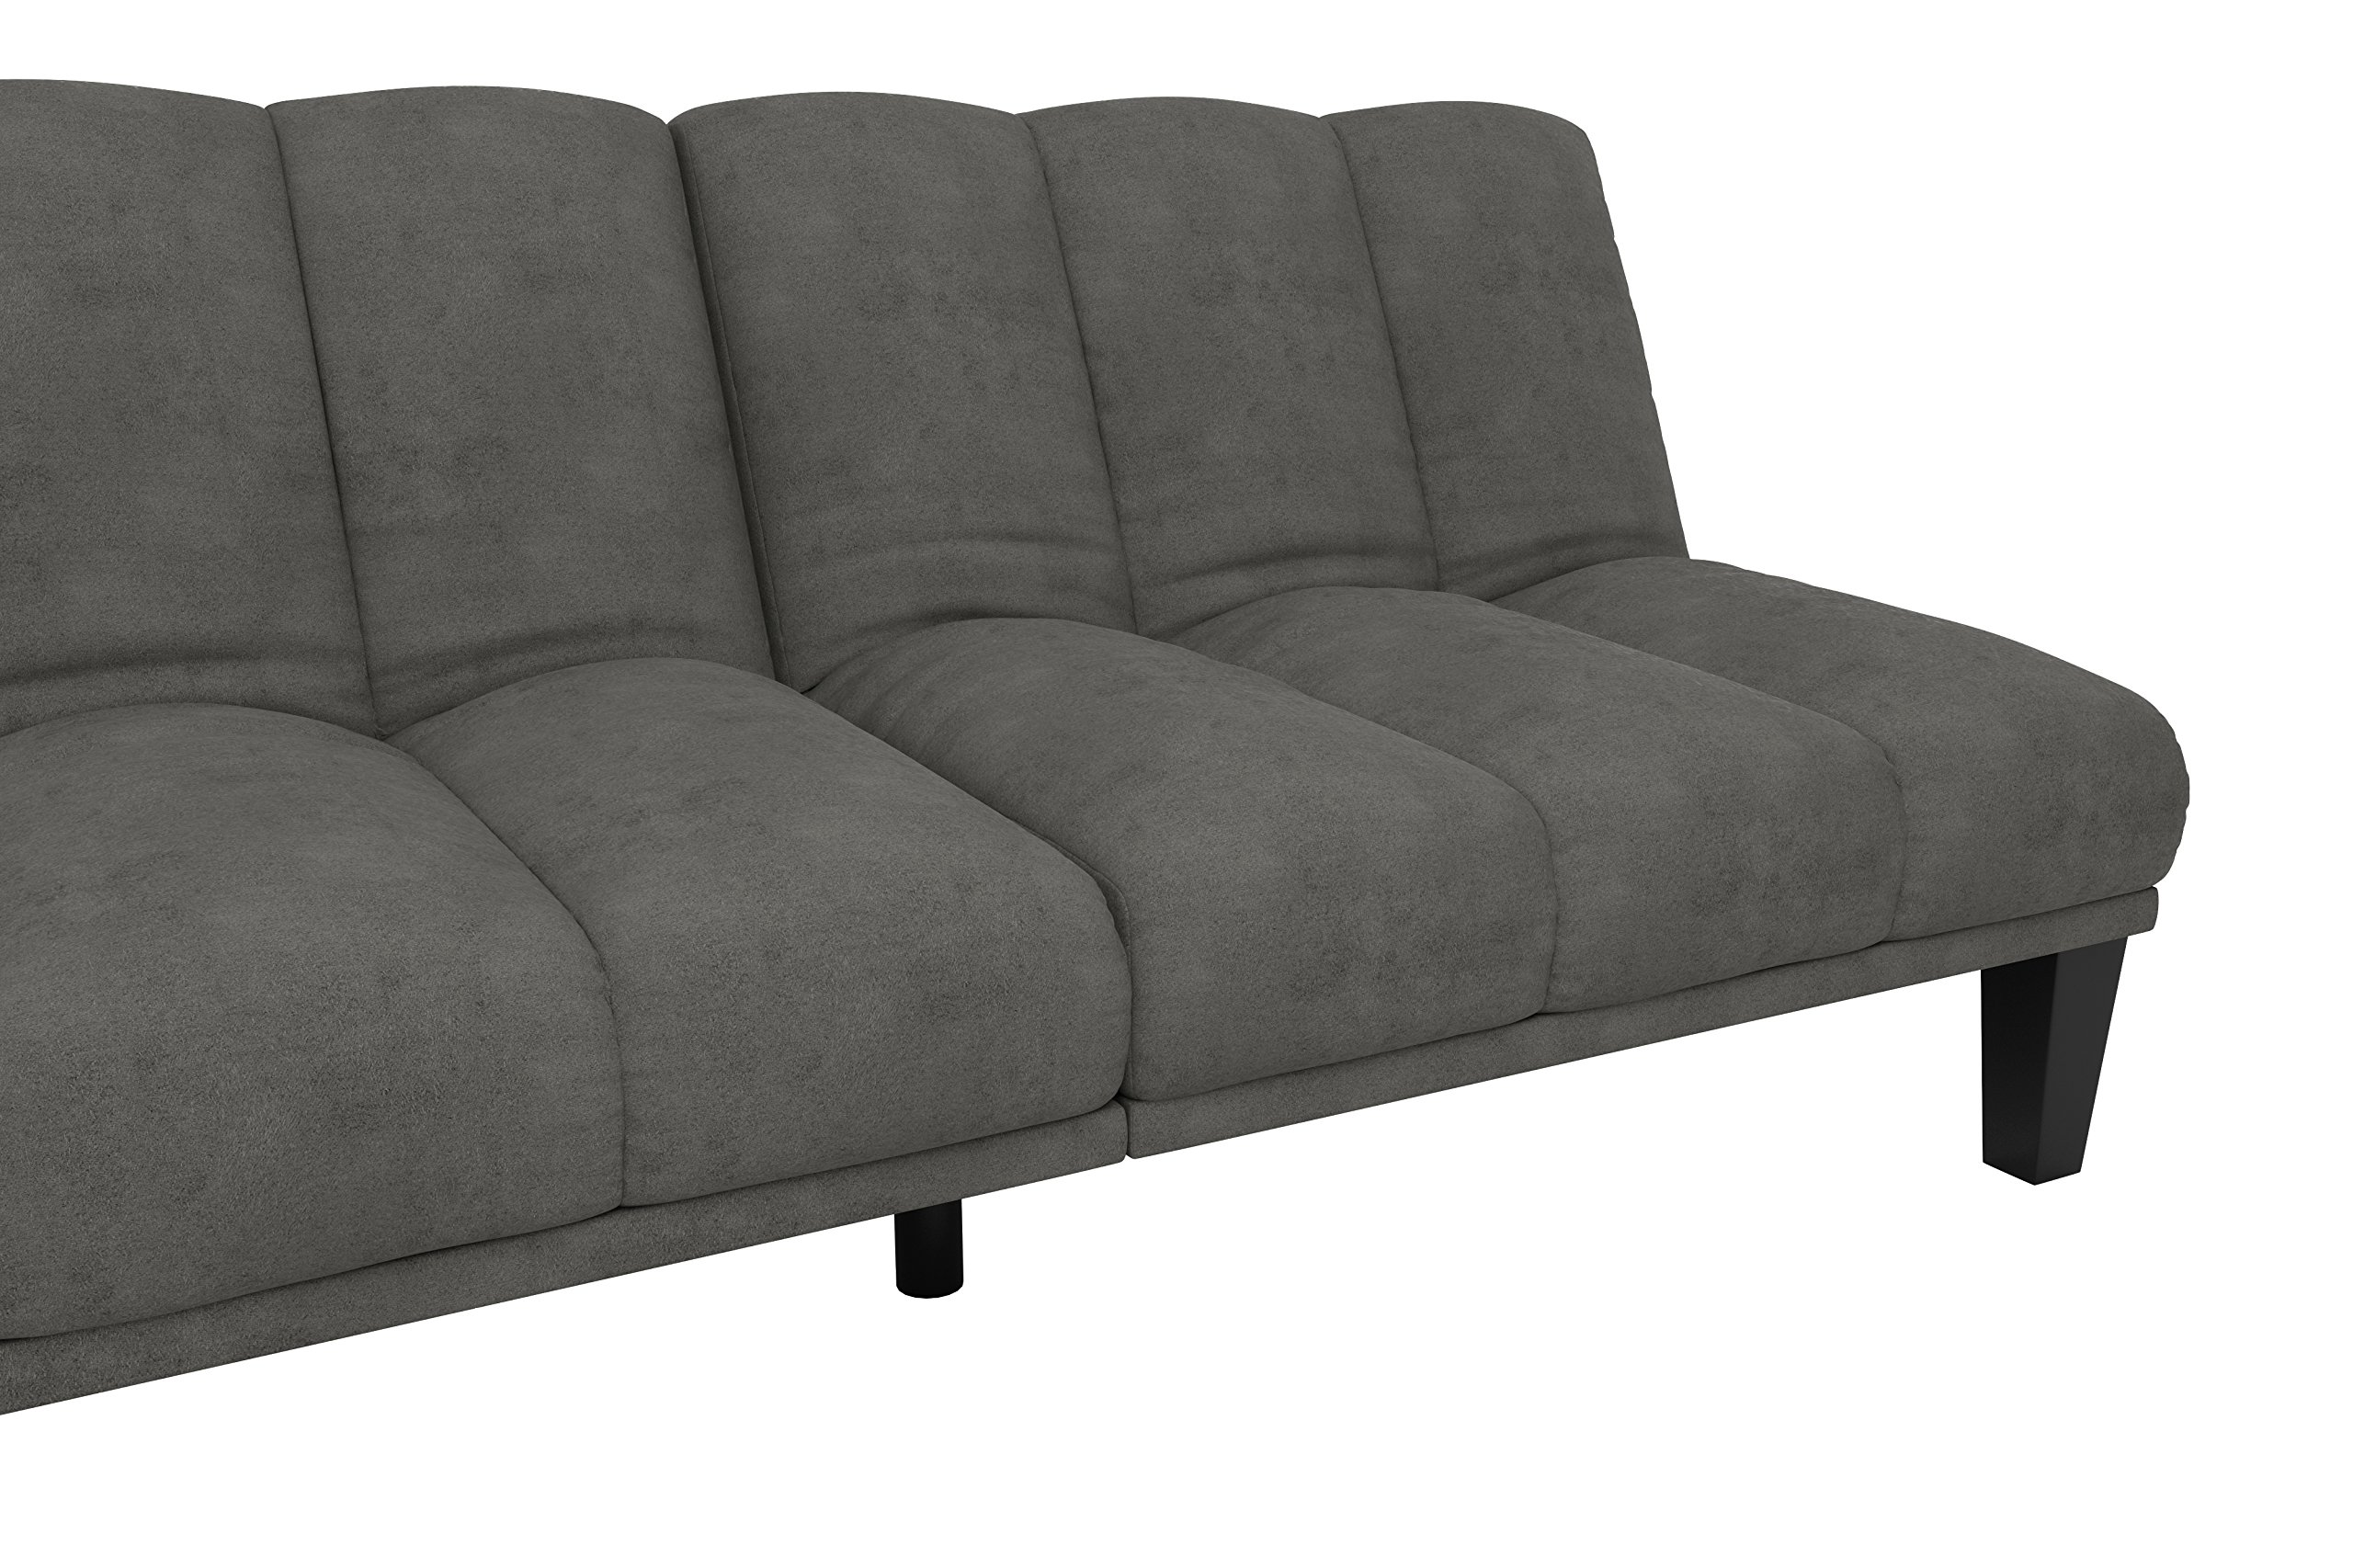 DHP Hamilton Estate Premium Sofa Futon Sleeper Comfortable Plush Upholstery, Rich Gray by DHP (Image #9)